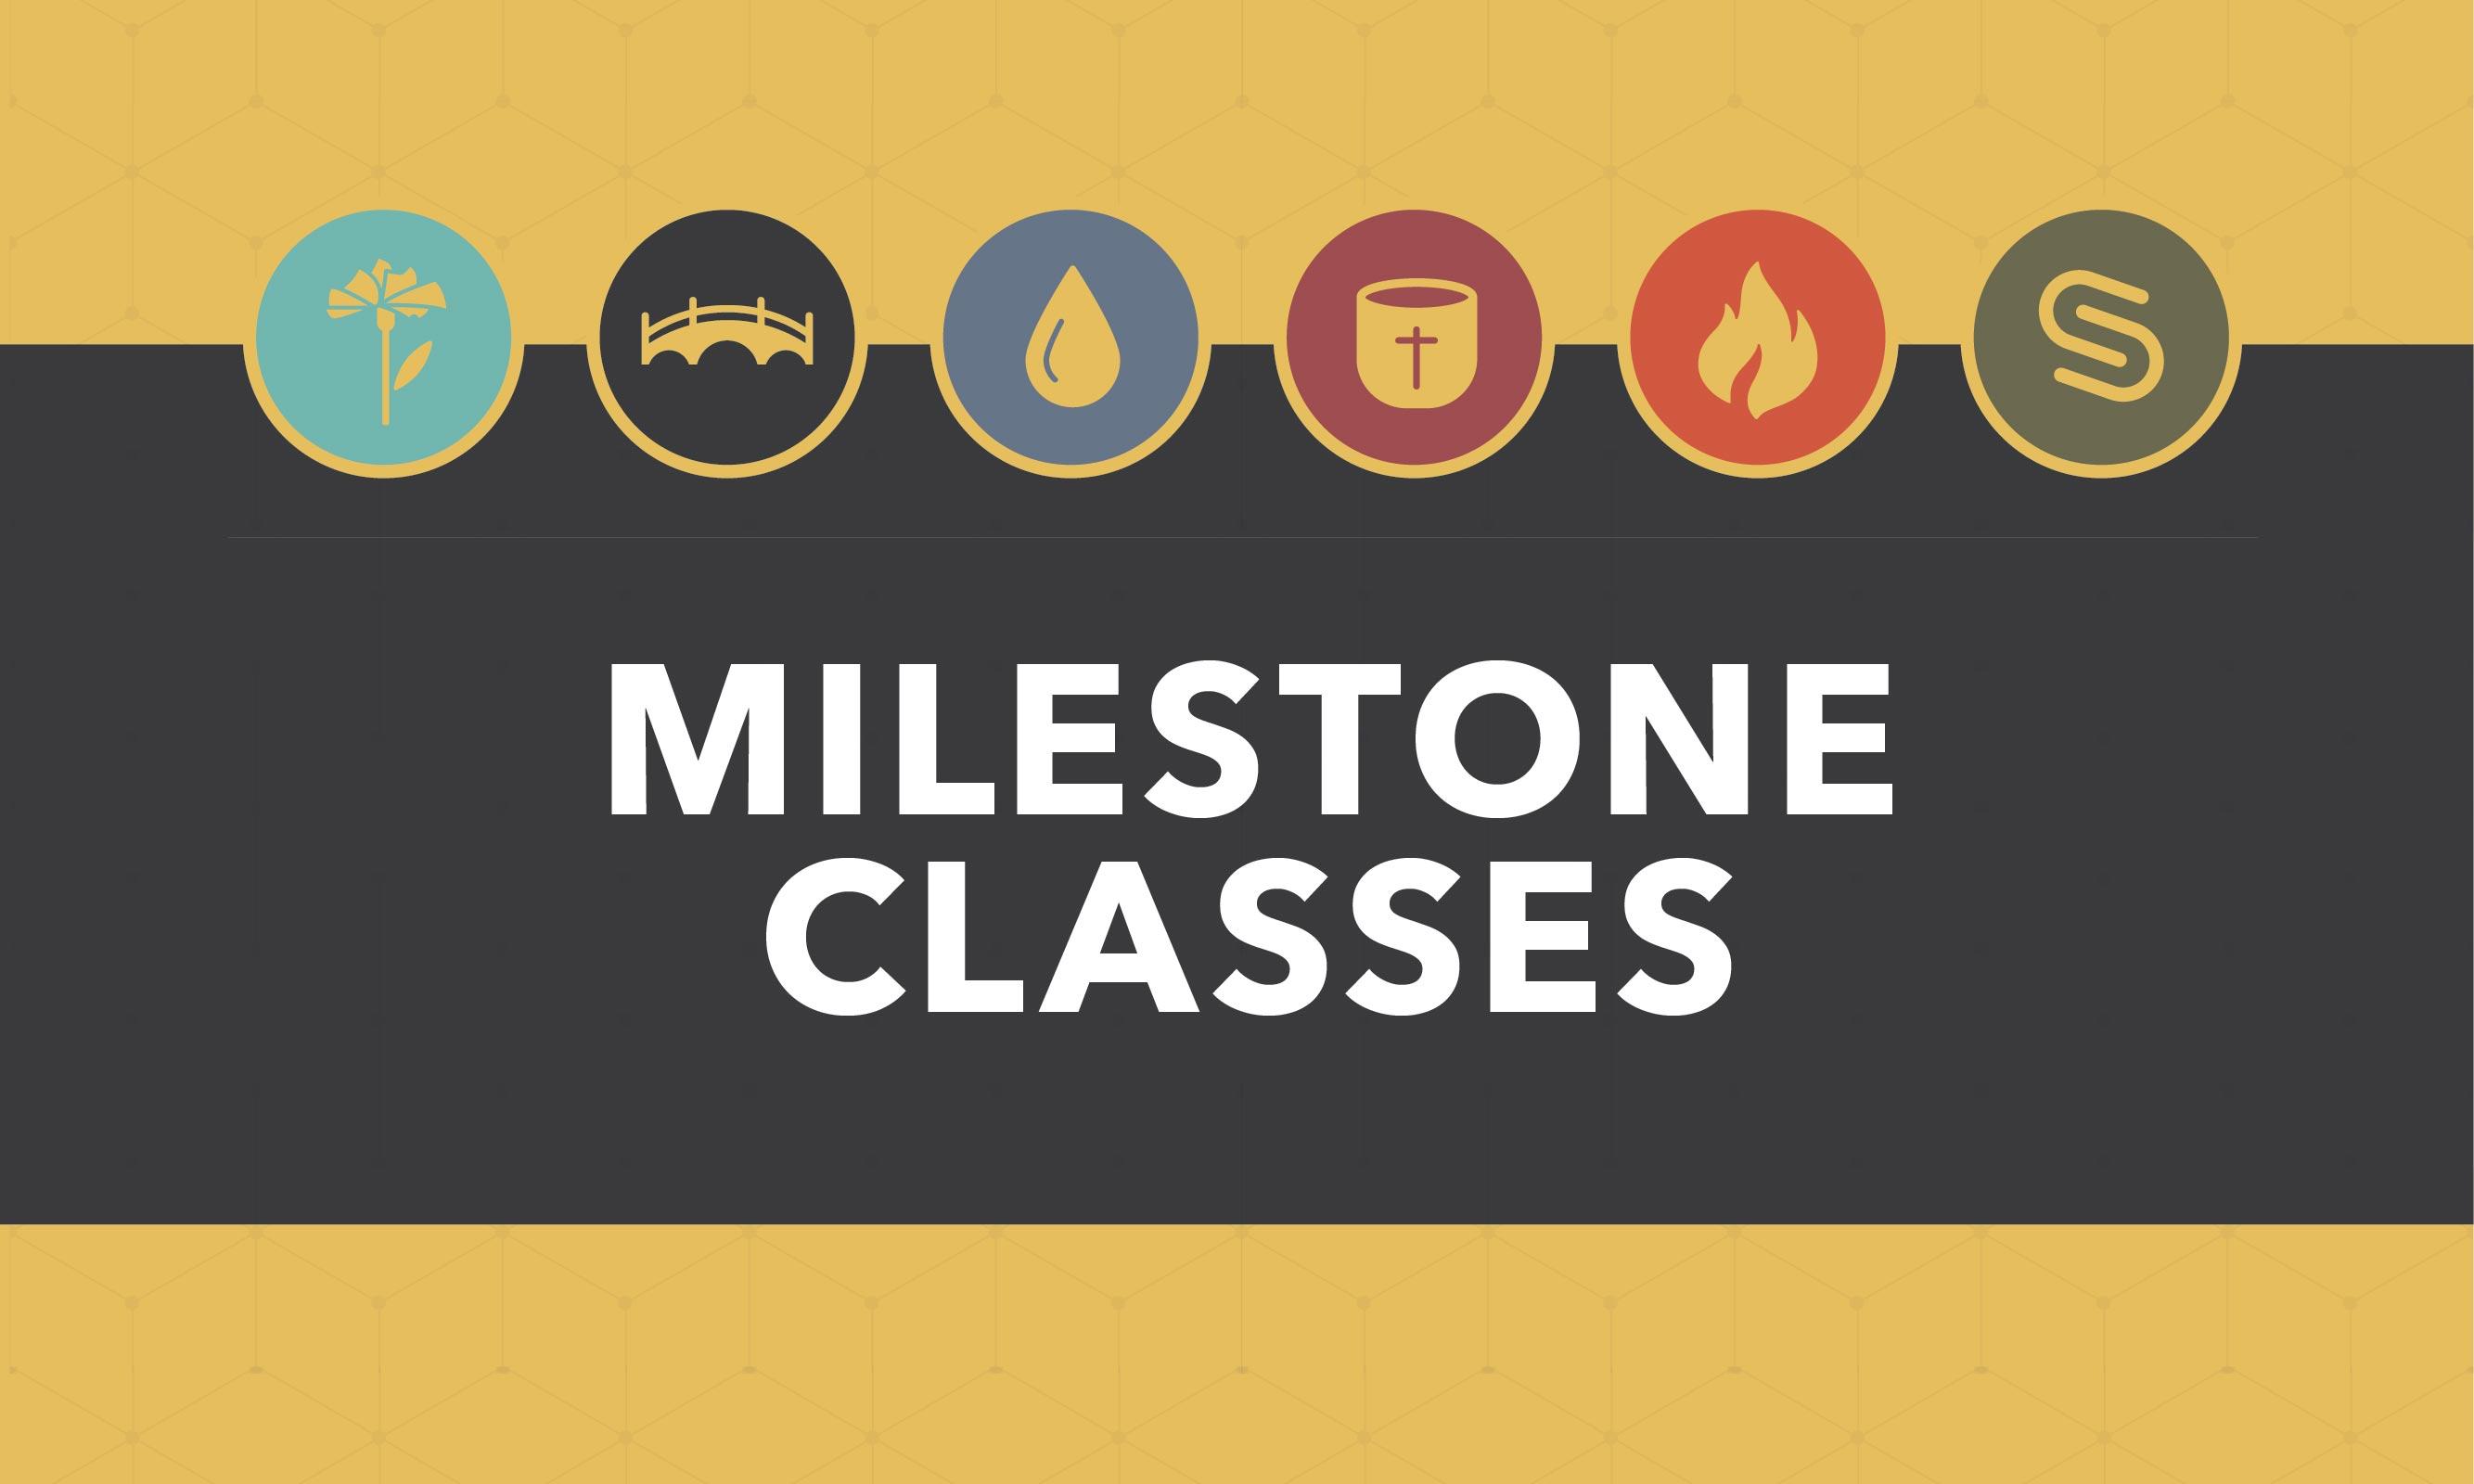 Milestone Classes (JPG)